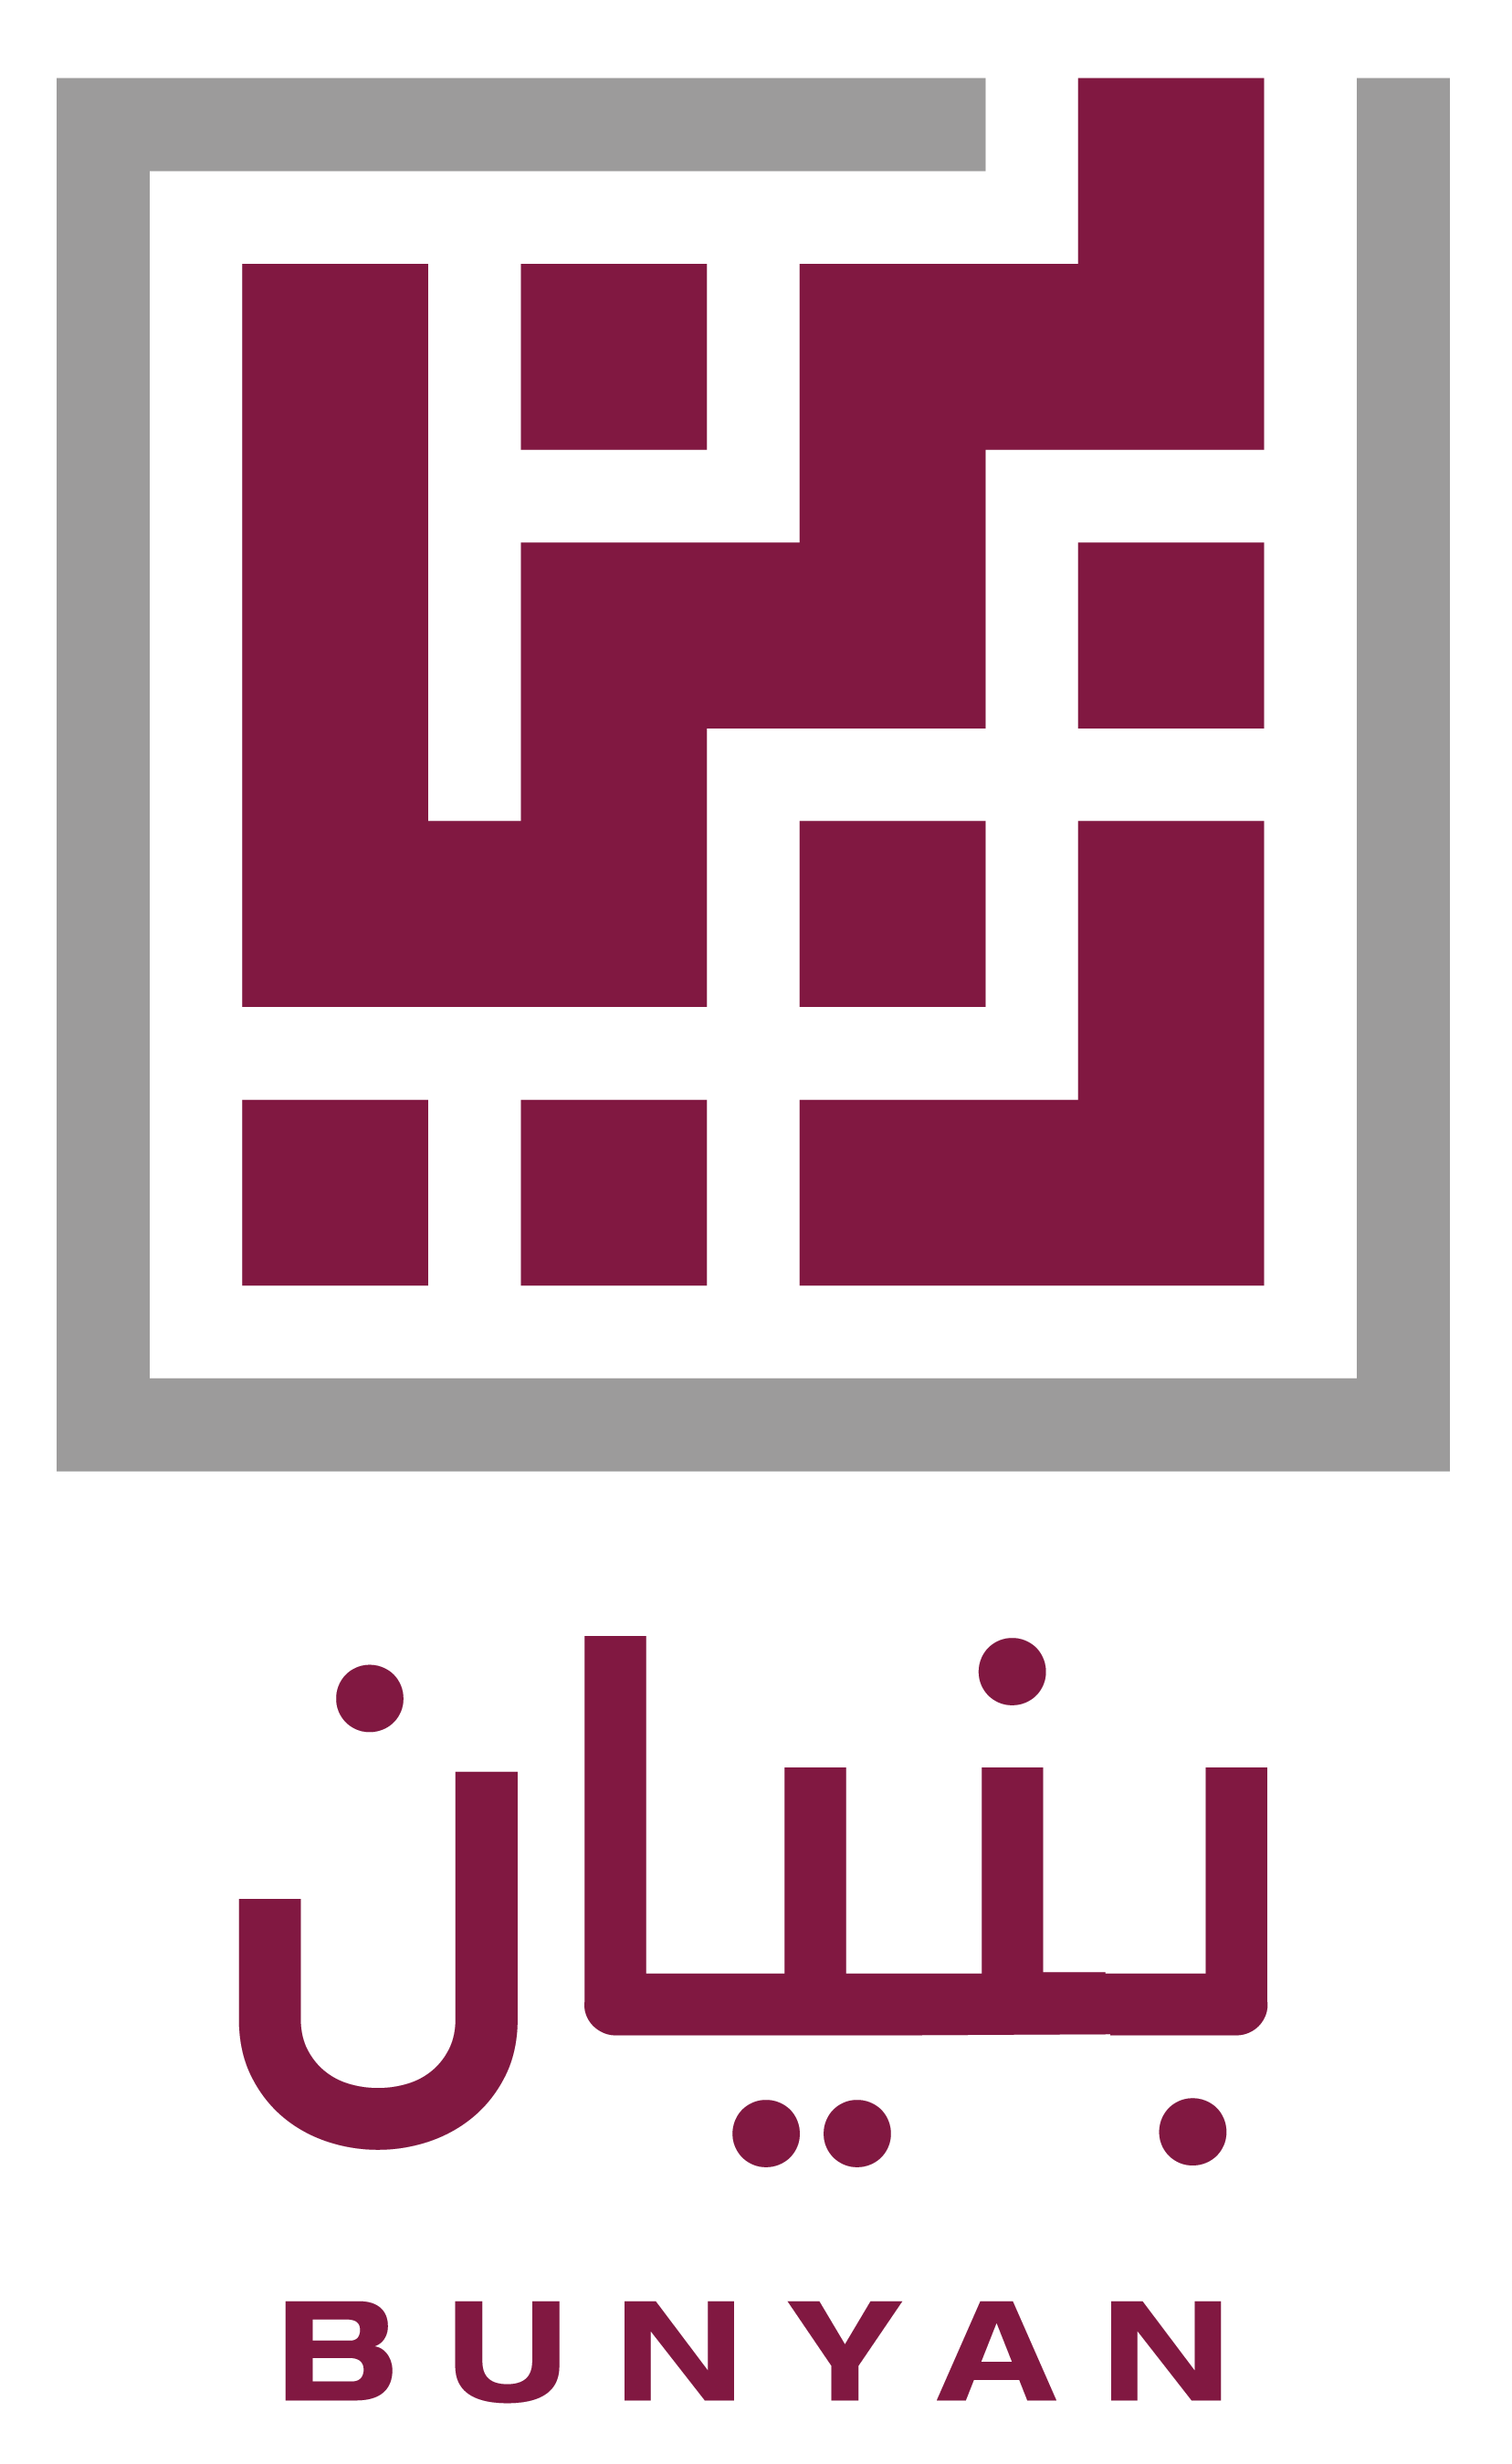 Bunyan organization